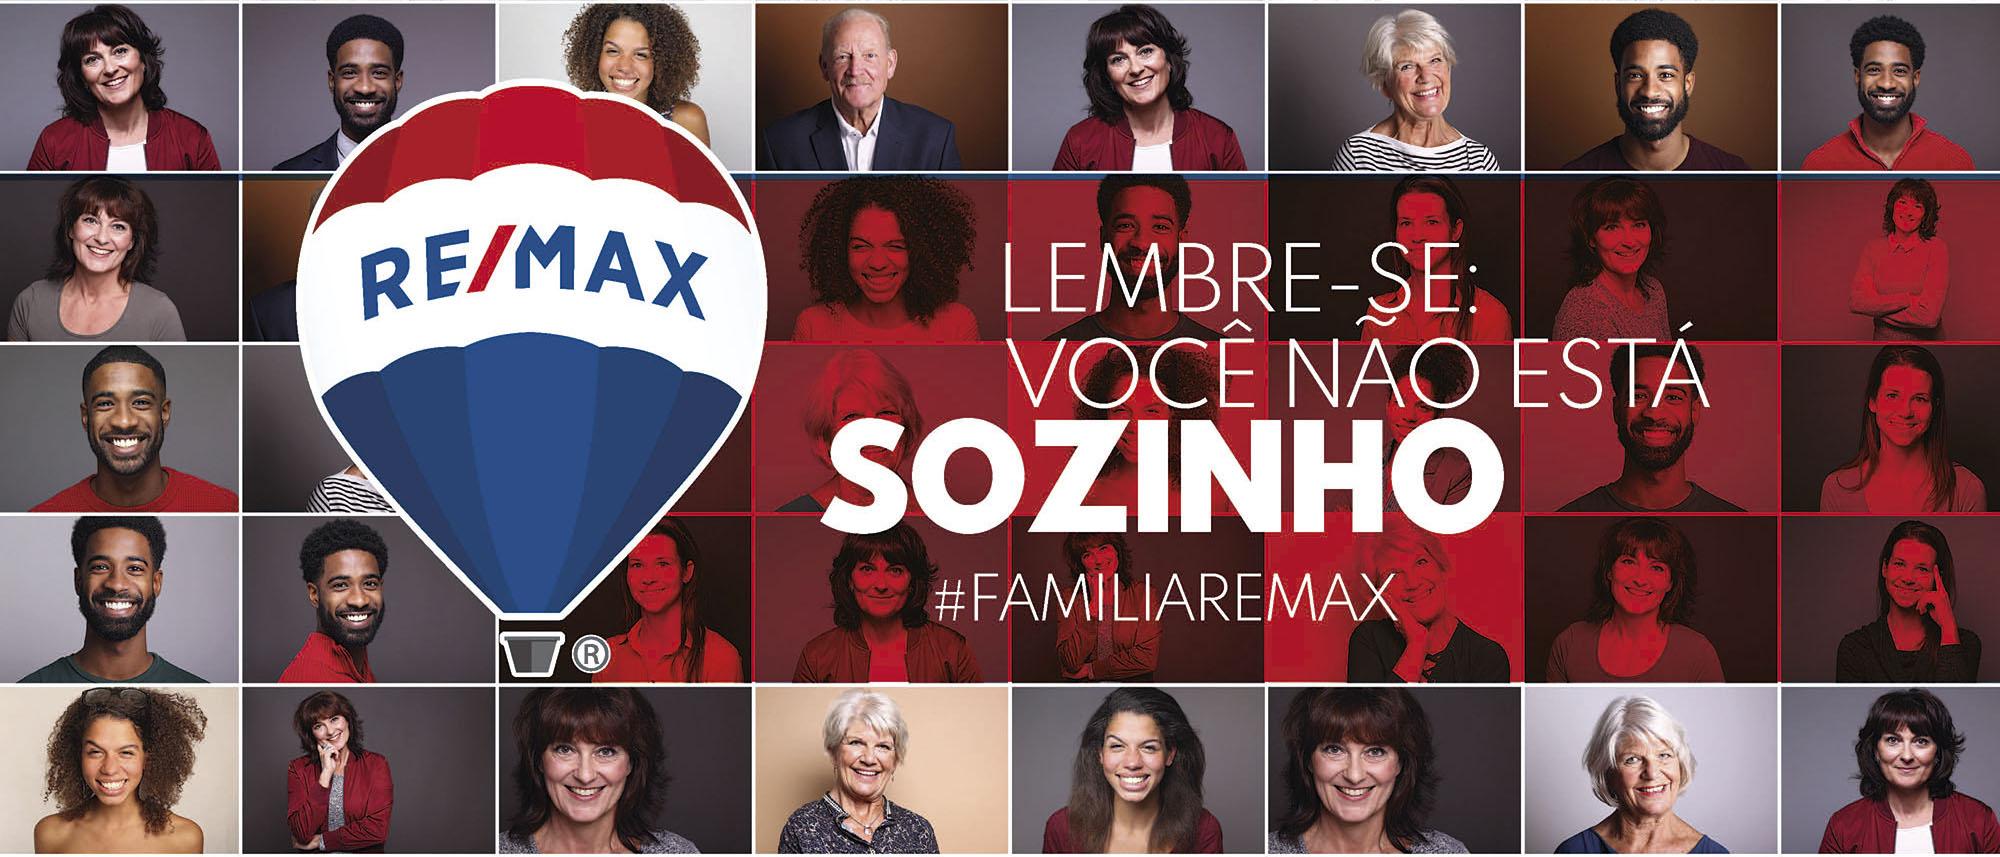 Família RE/MAX